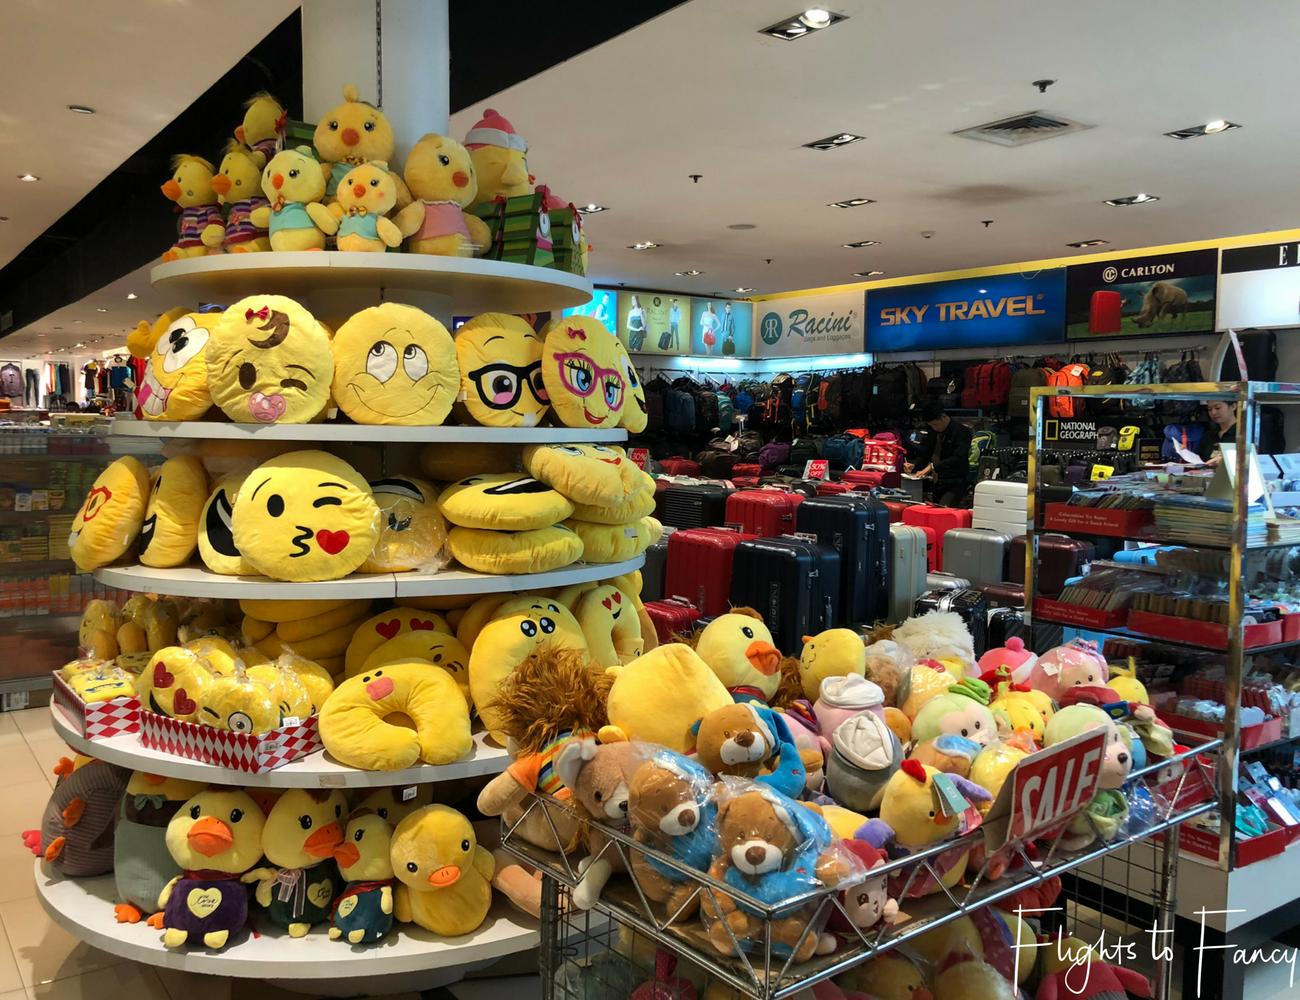 Flights to Fancy Makati Shopping Malls Landmark Makati